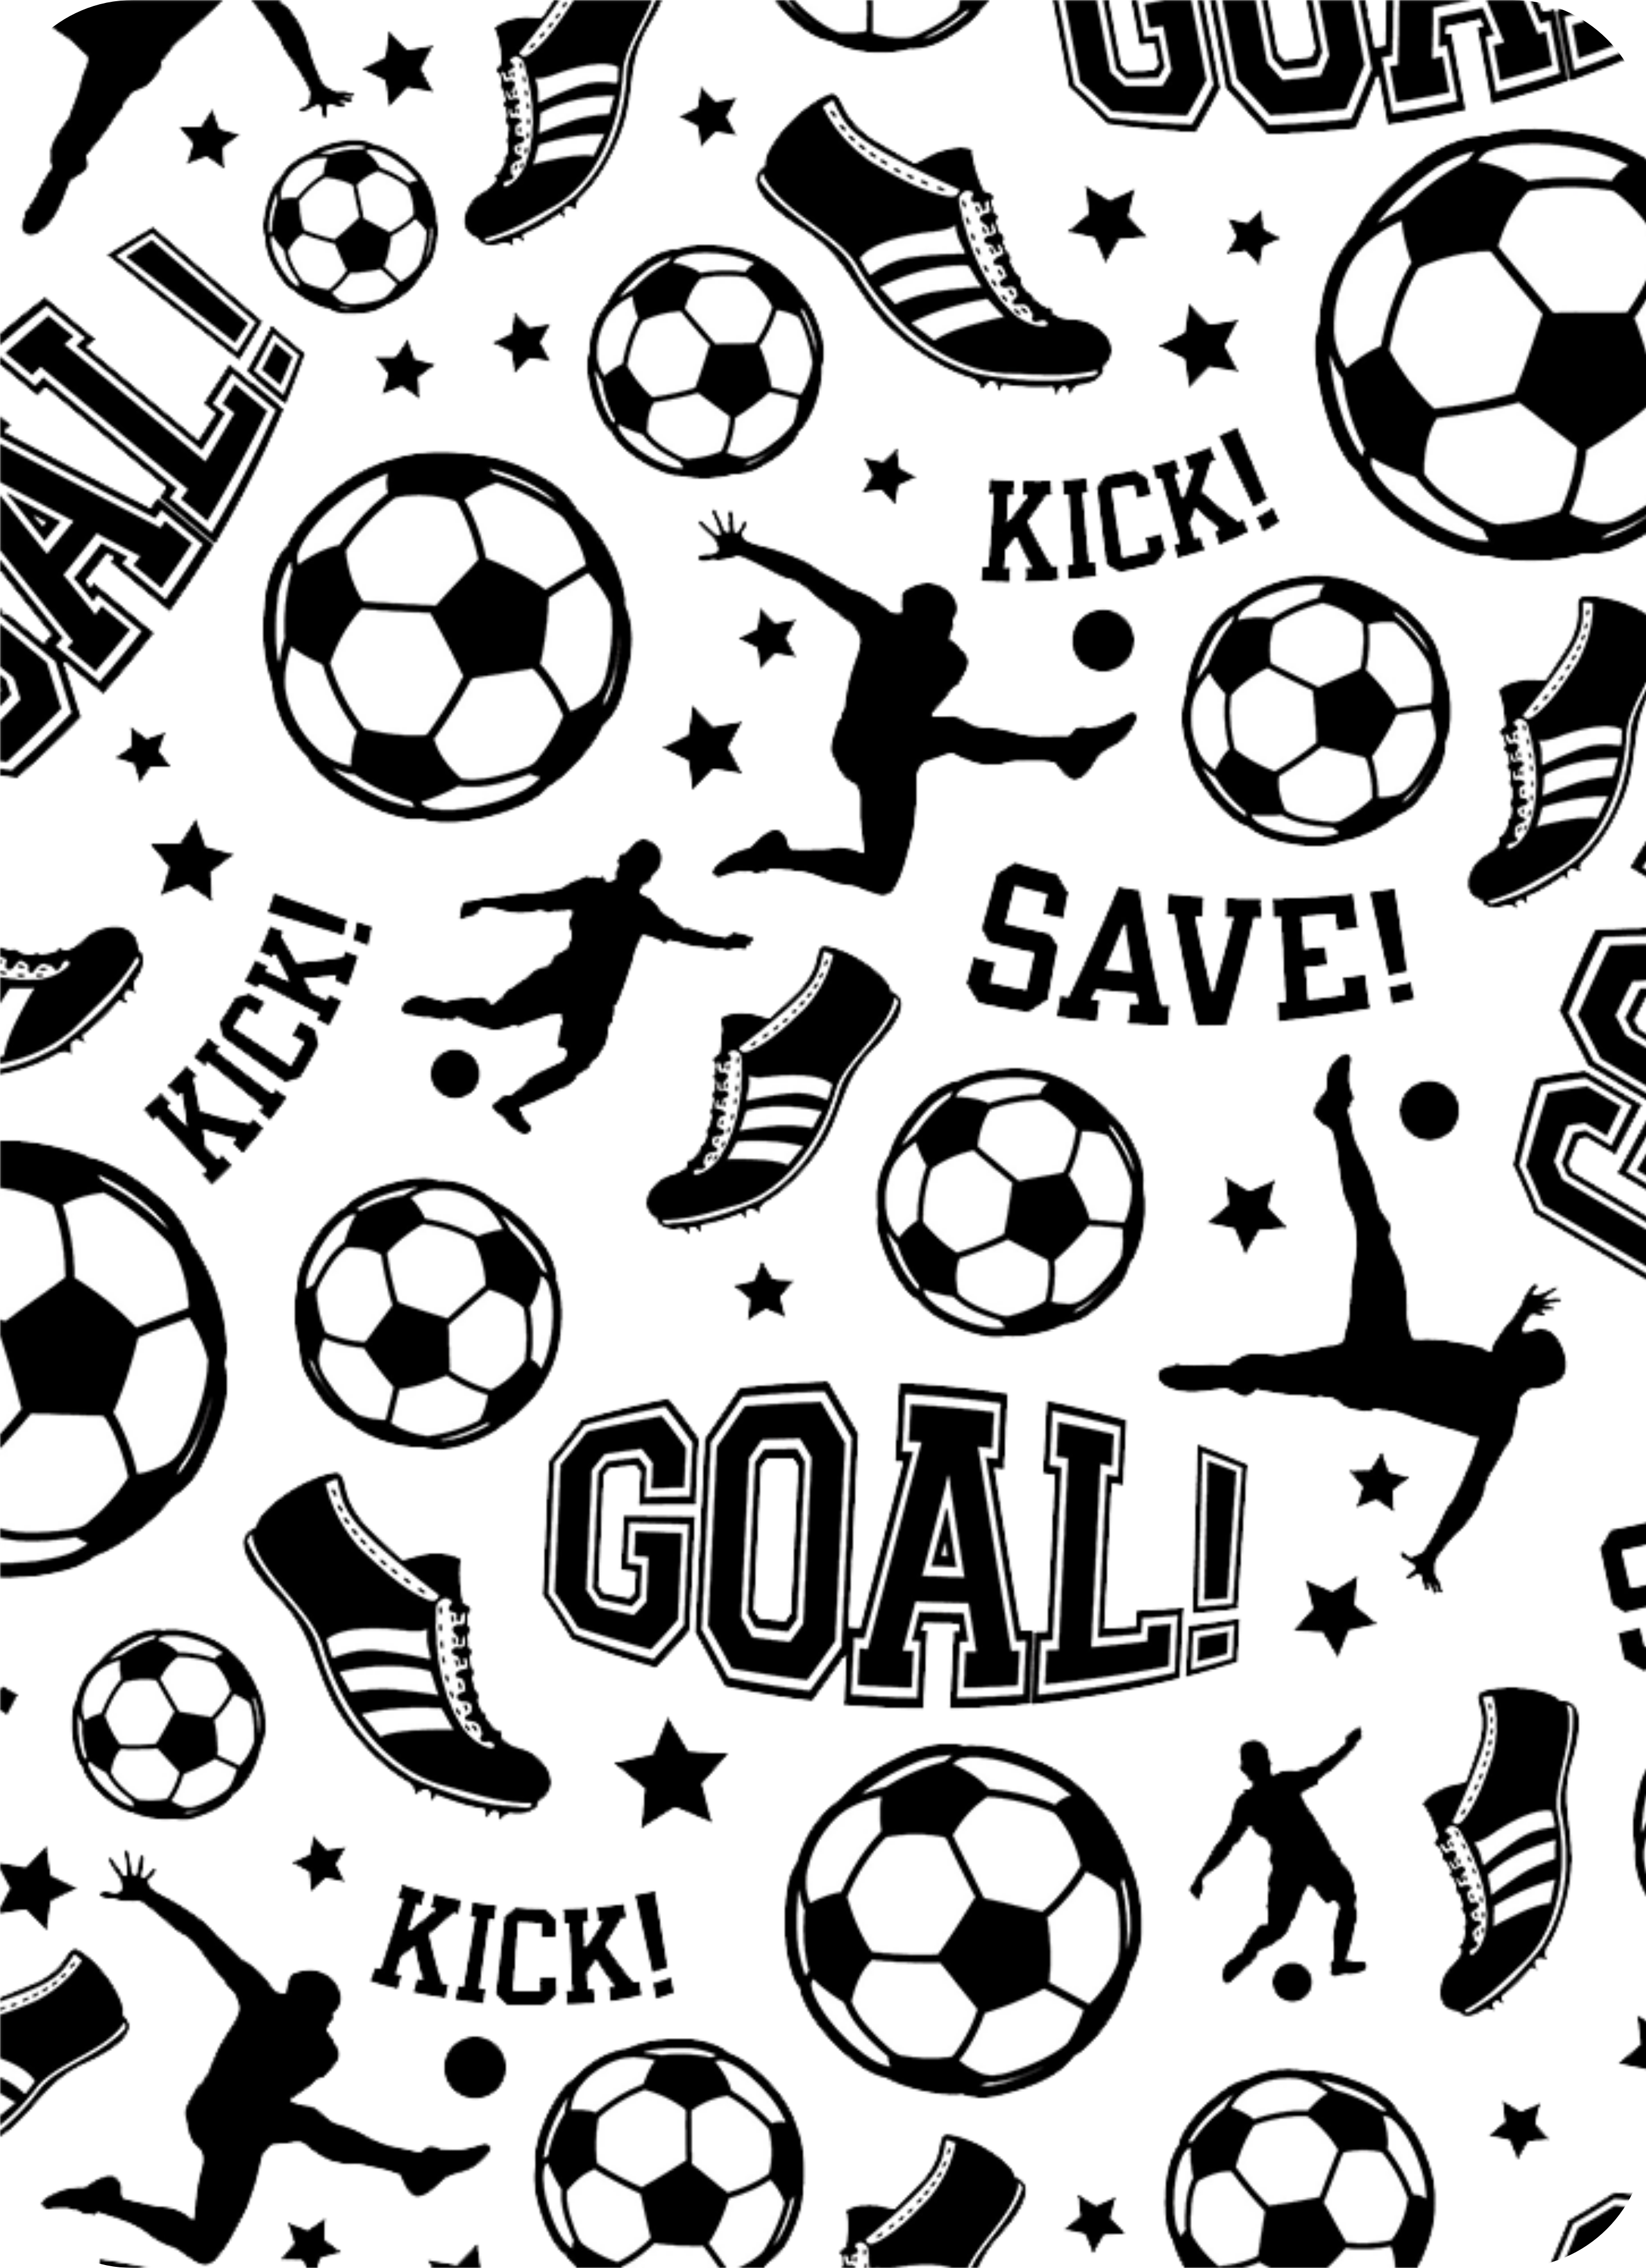 Clipboard clipart soccer. Personalized custom monogram boutiqueme